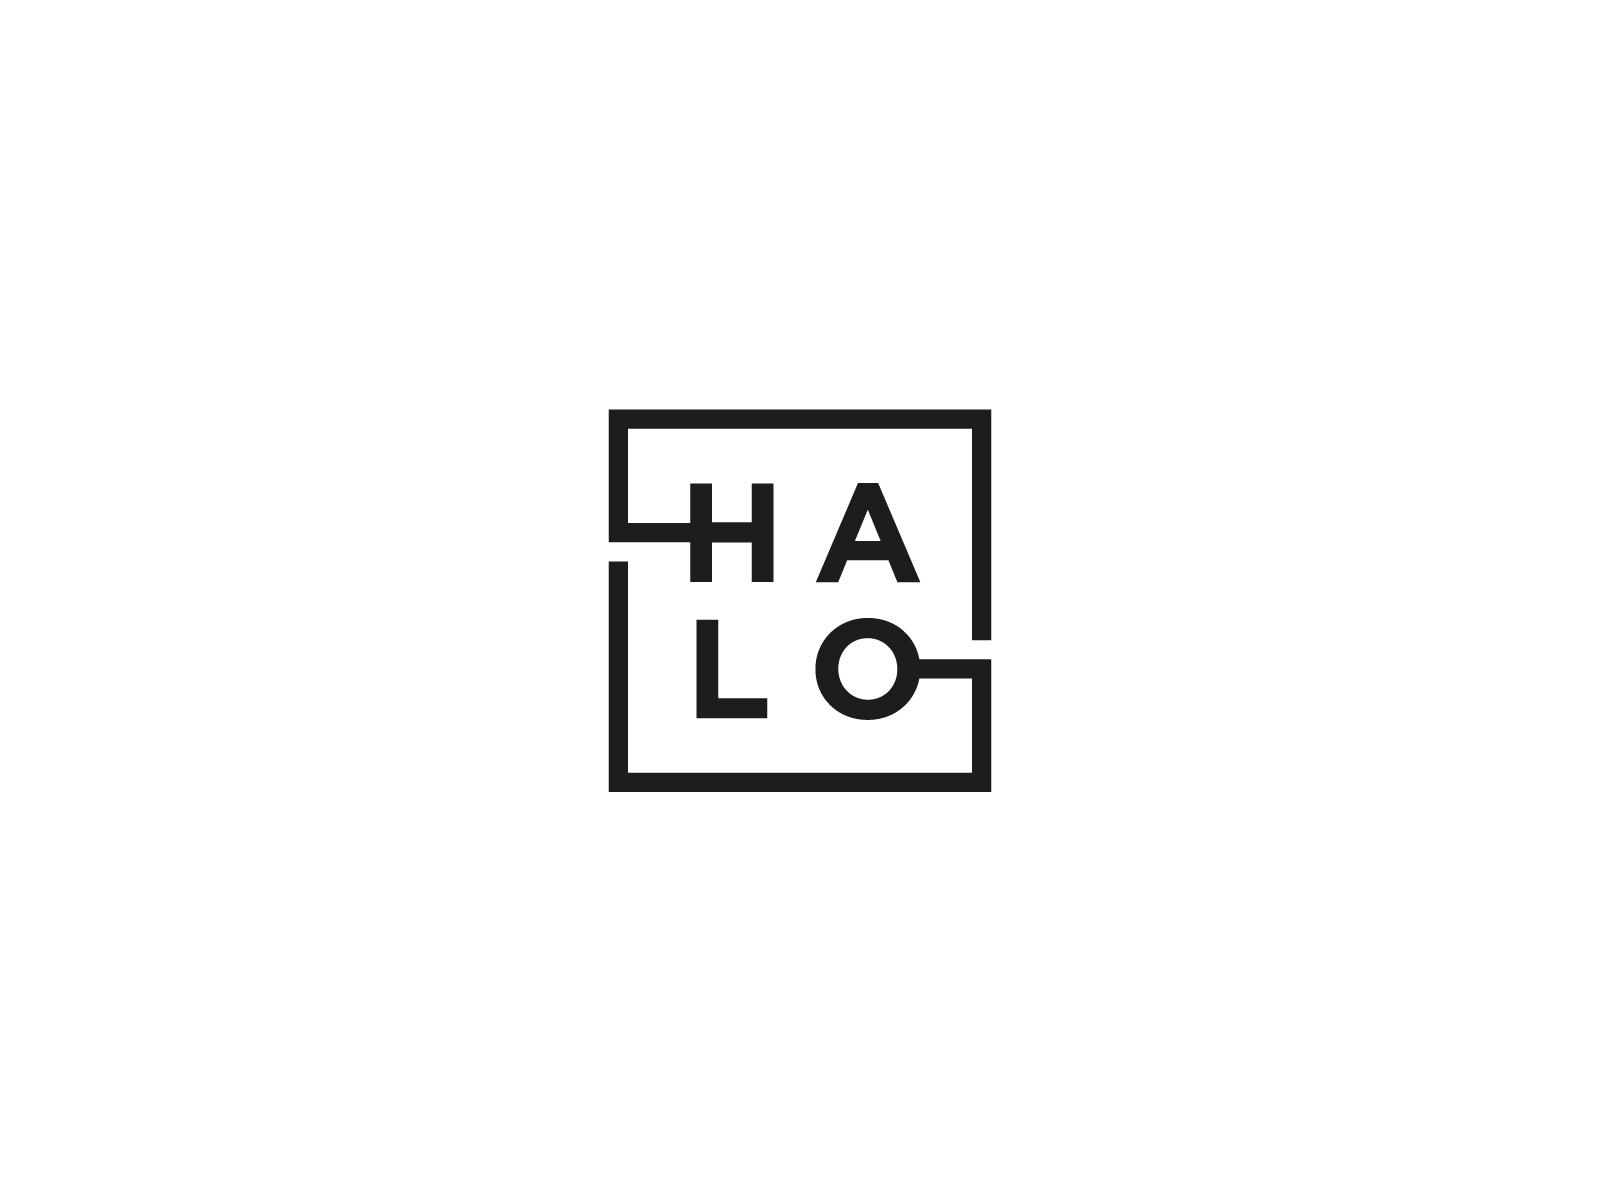 Halo Logo By Tallant Design On Dribbble 6 halo logo templates halo 6. halo logo by tallant design on dribbble